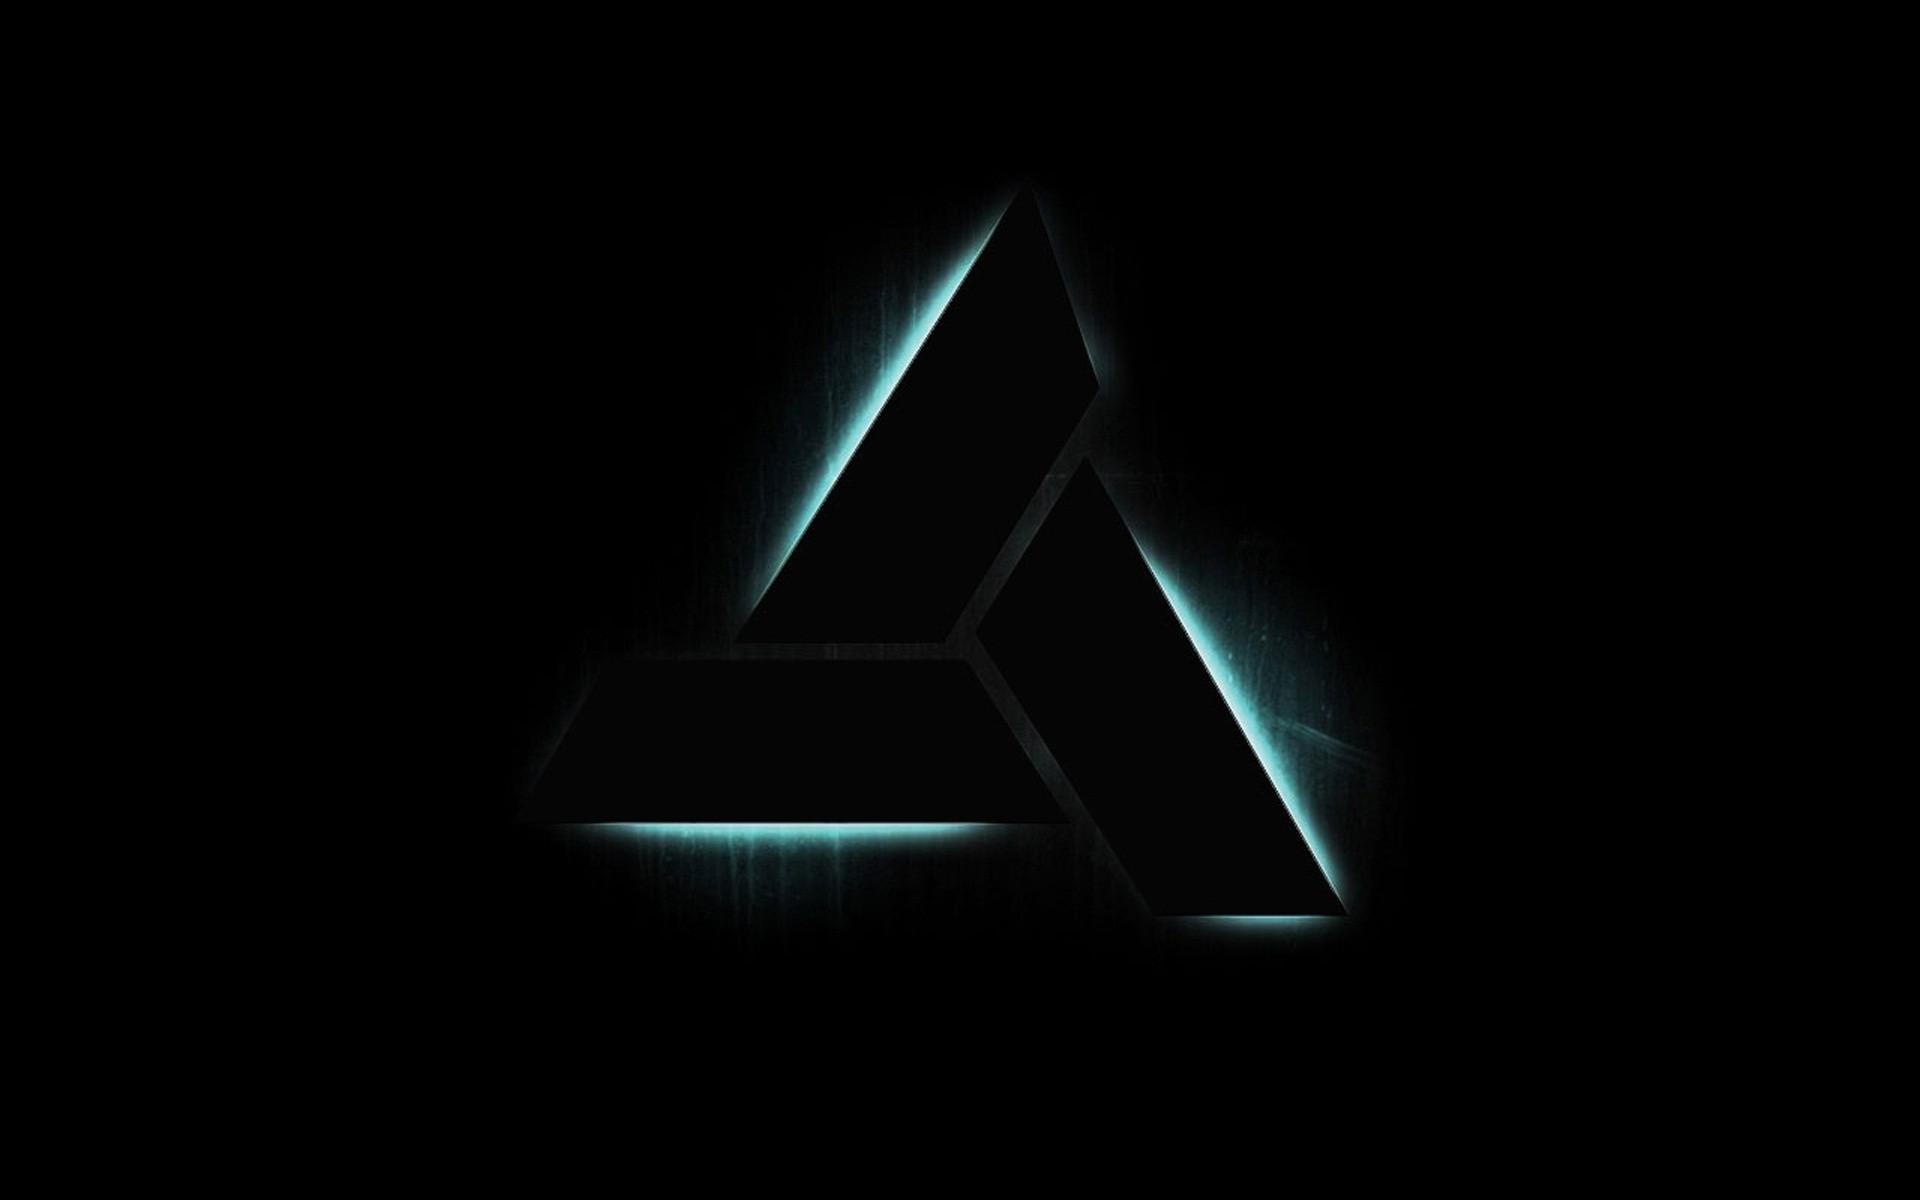 48 Assassins Creed Logo Wallpaper On Wallpapersafari